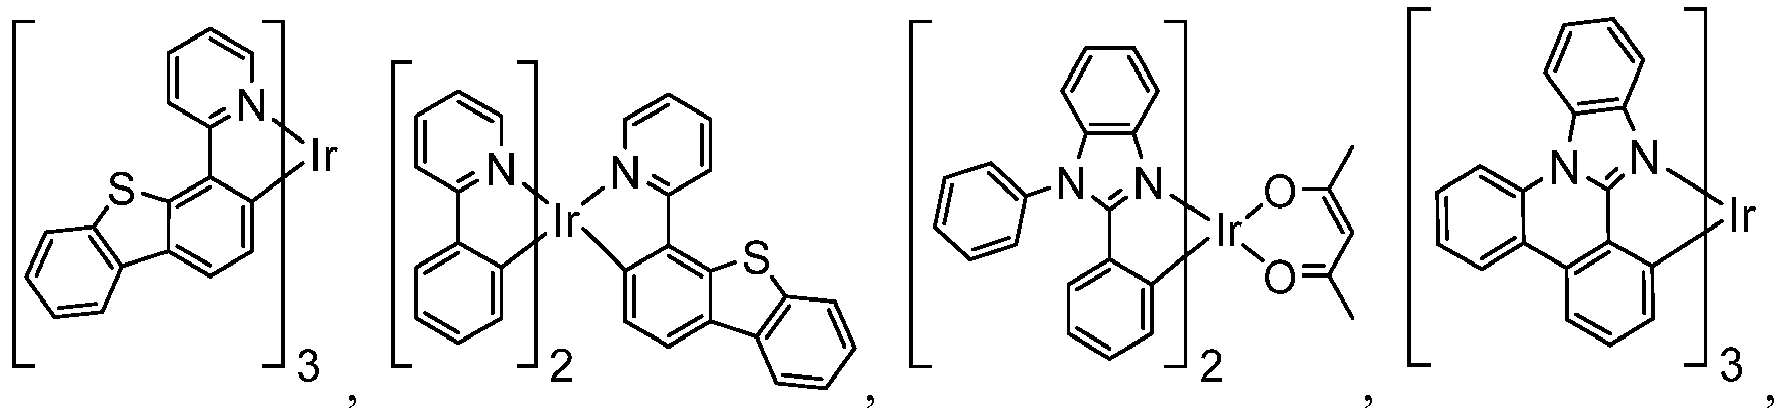 Figure imgb0914